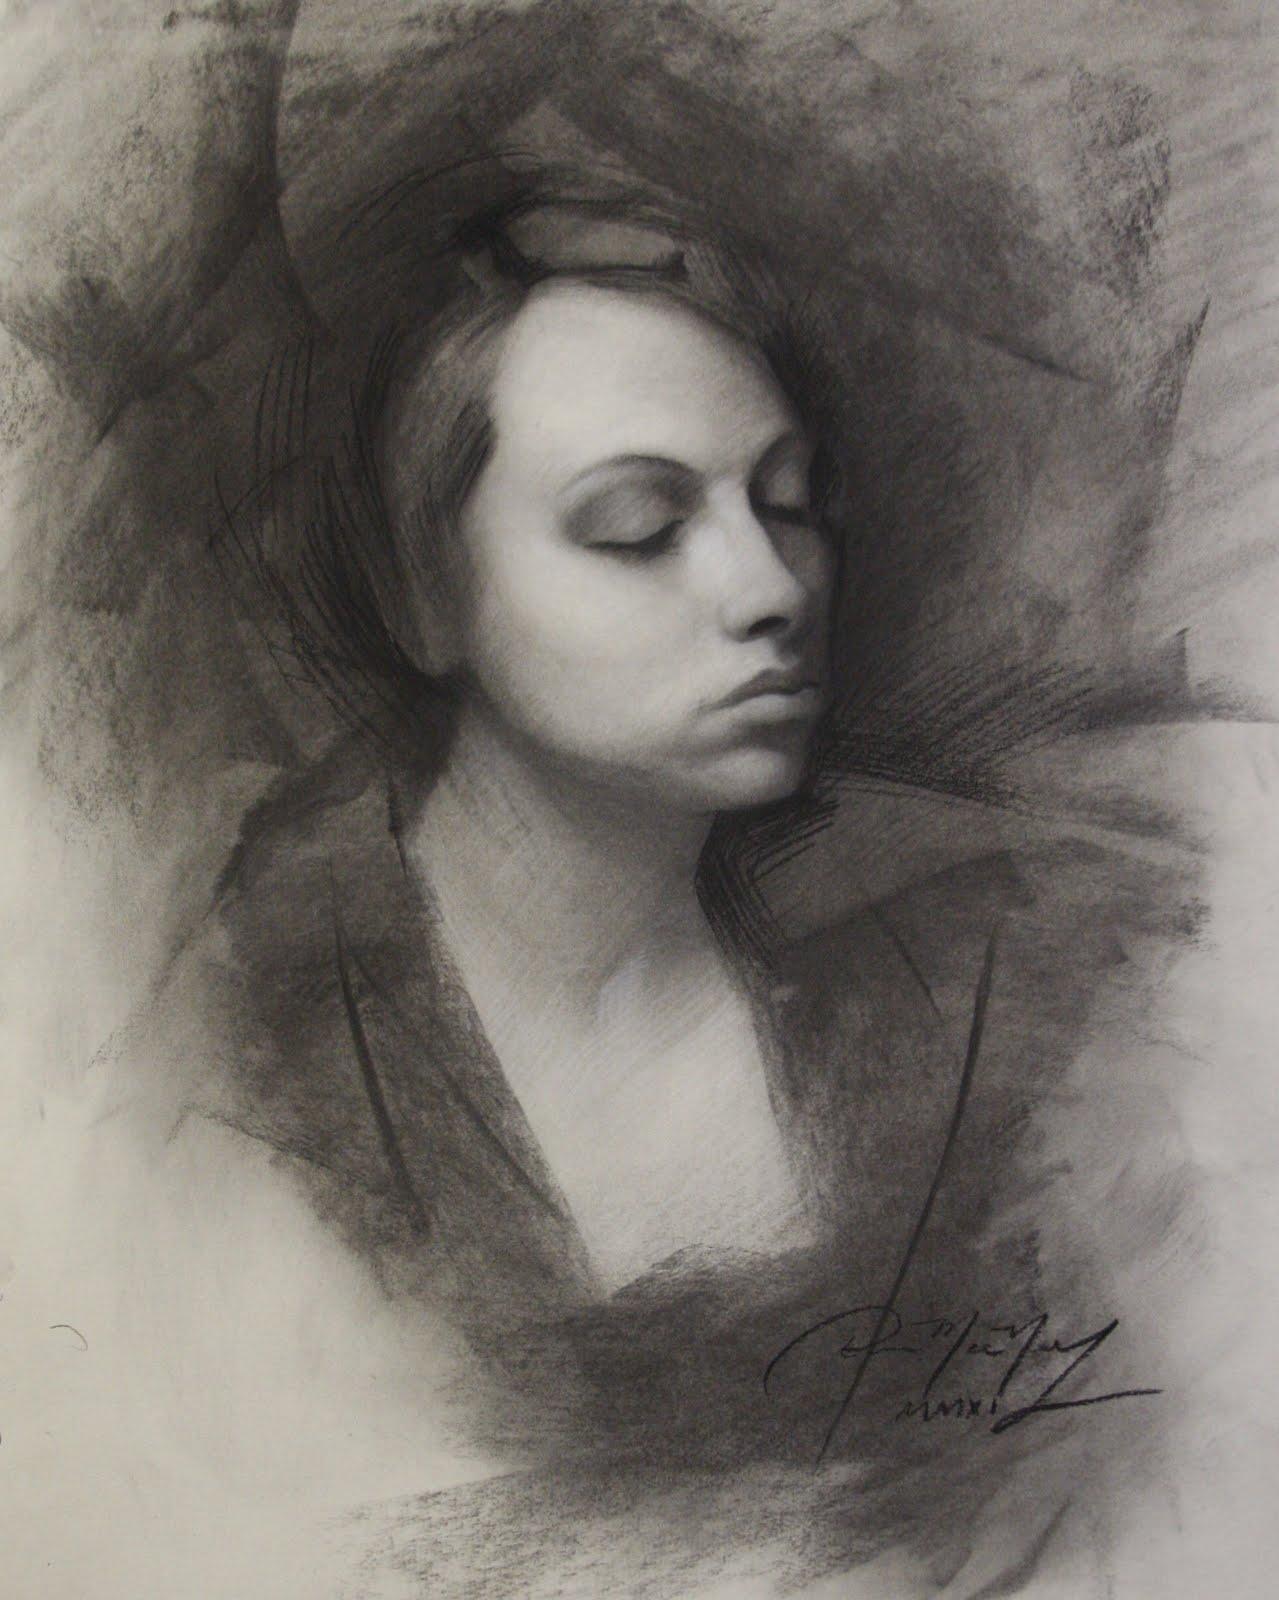 Drawn portrait coal Charcoal drawing 818x1024 final 818x1024